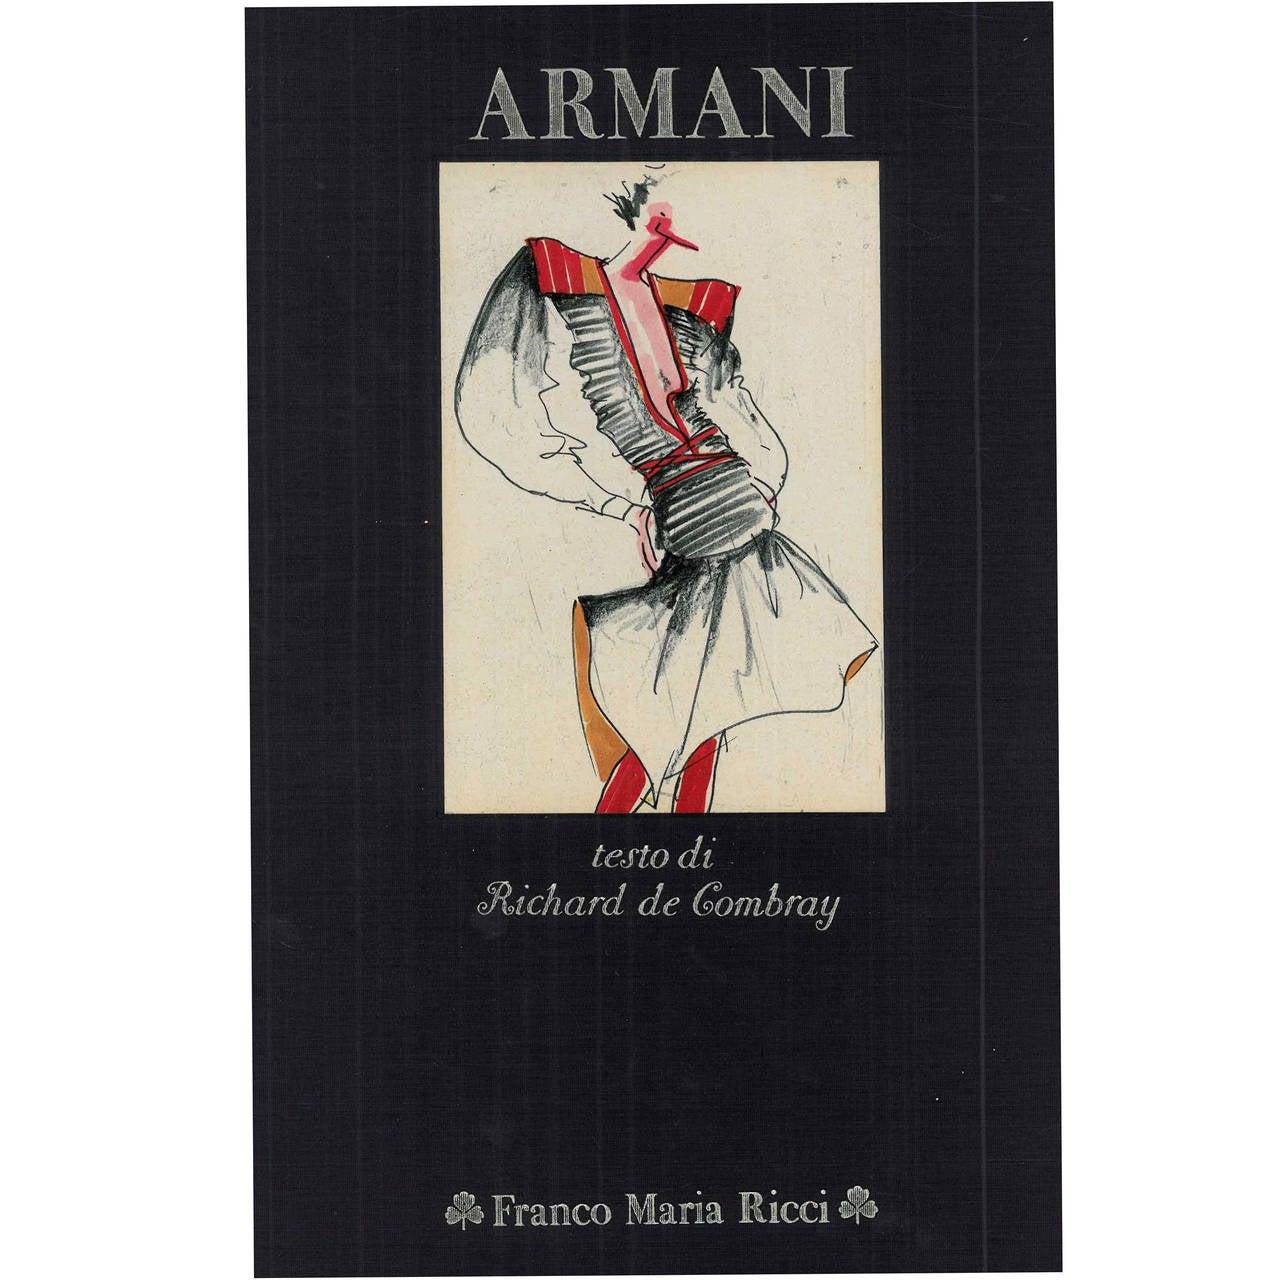 """Armani"" (book) - signed copy"